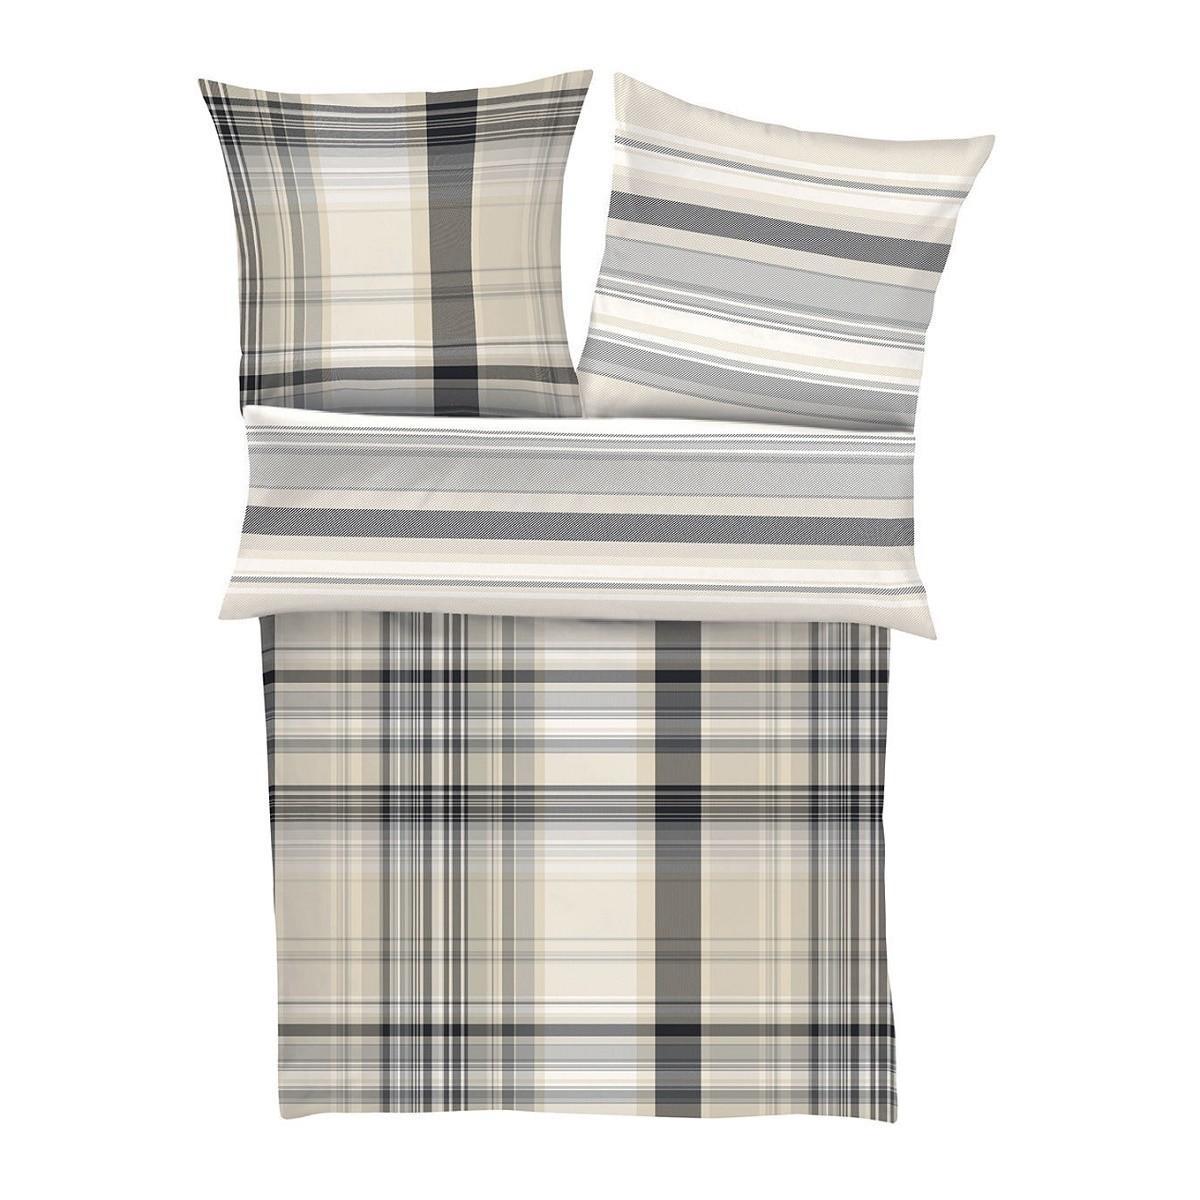 posteljnina iz satena bugatti - karo siva